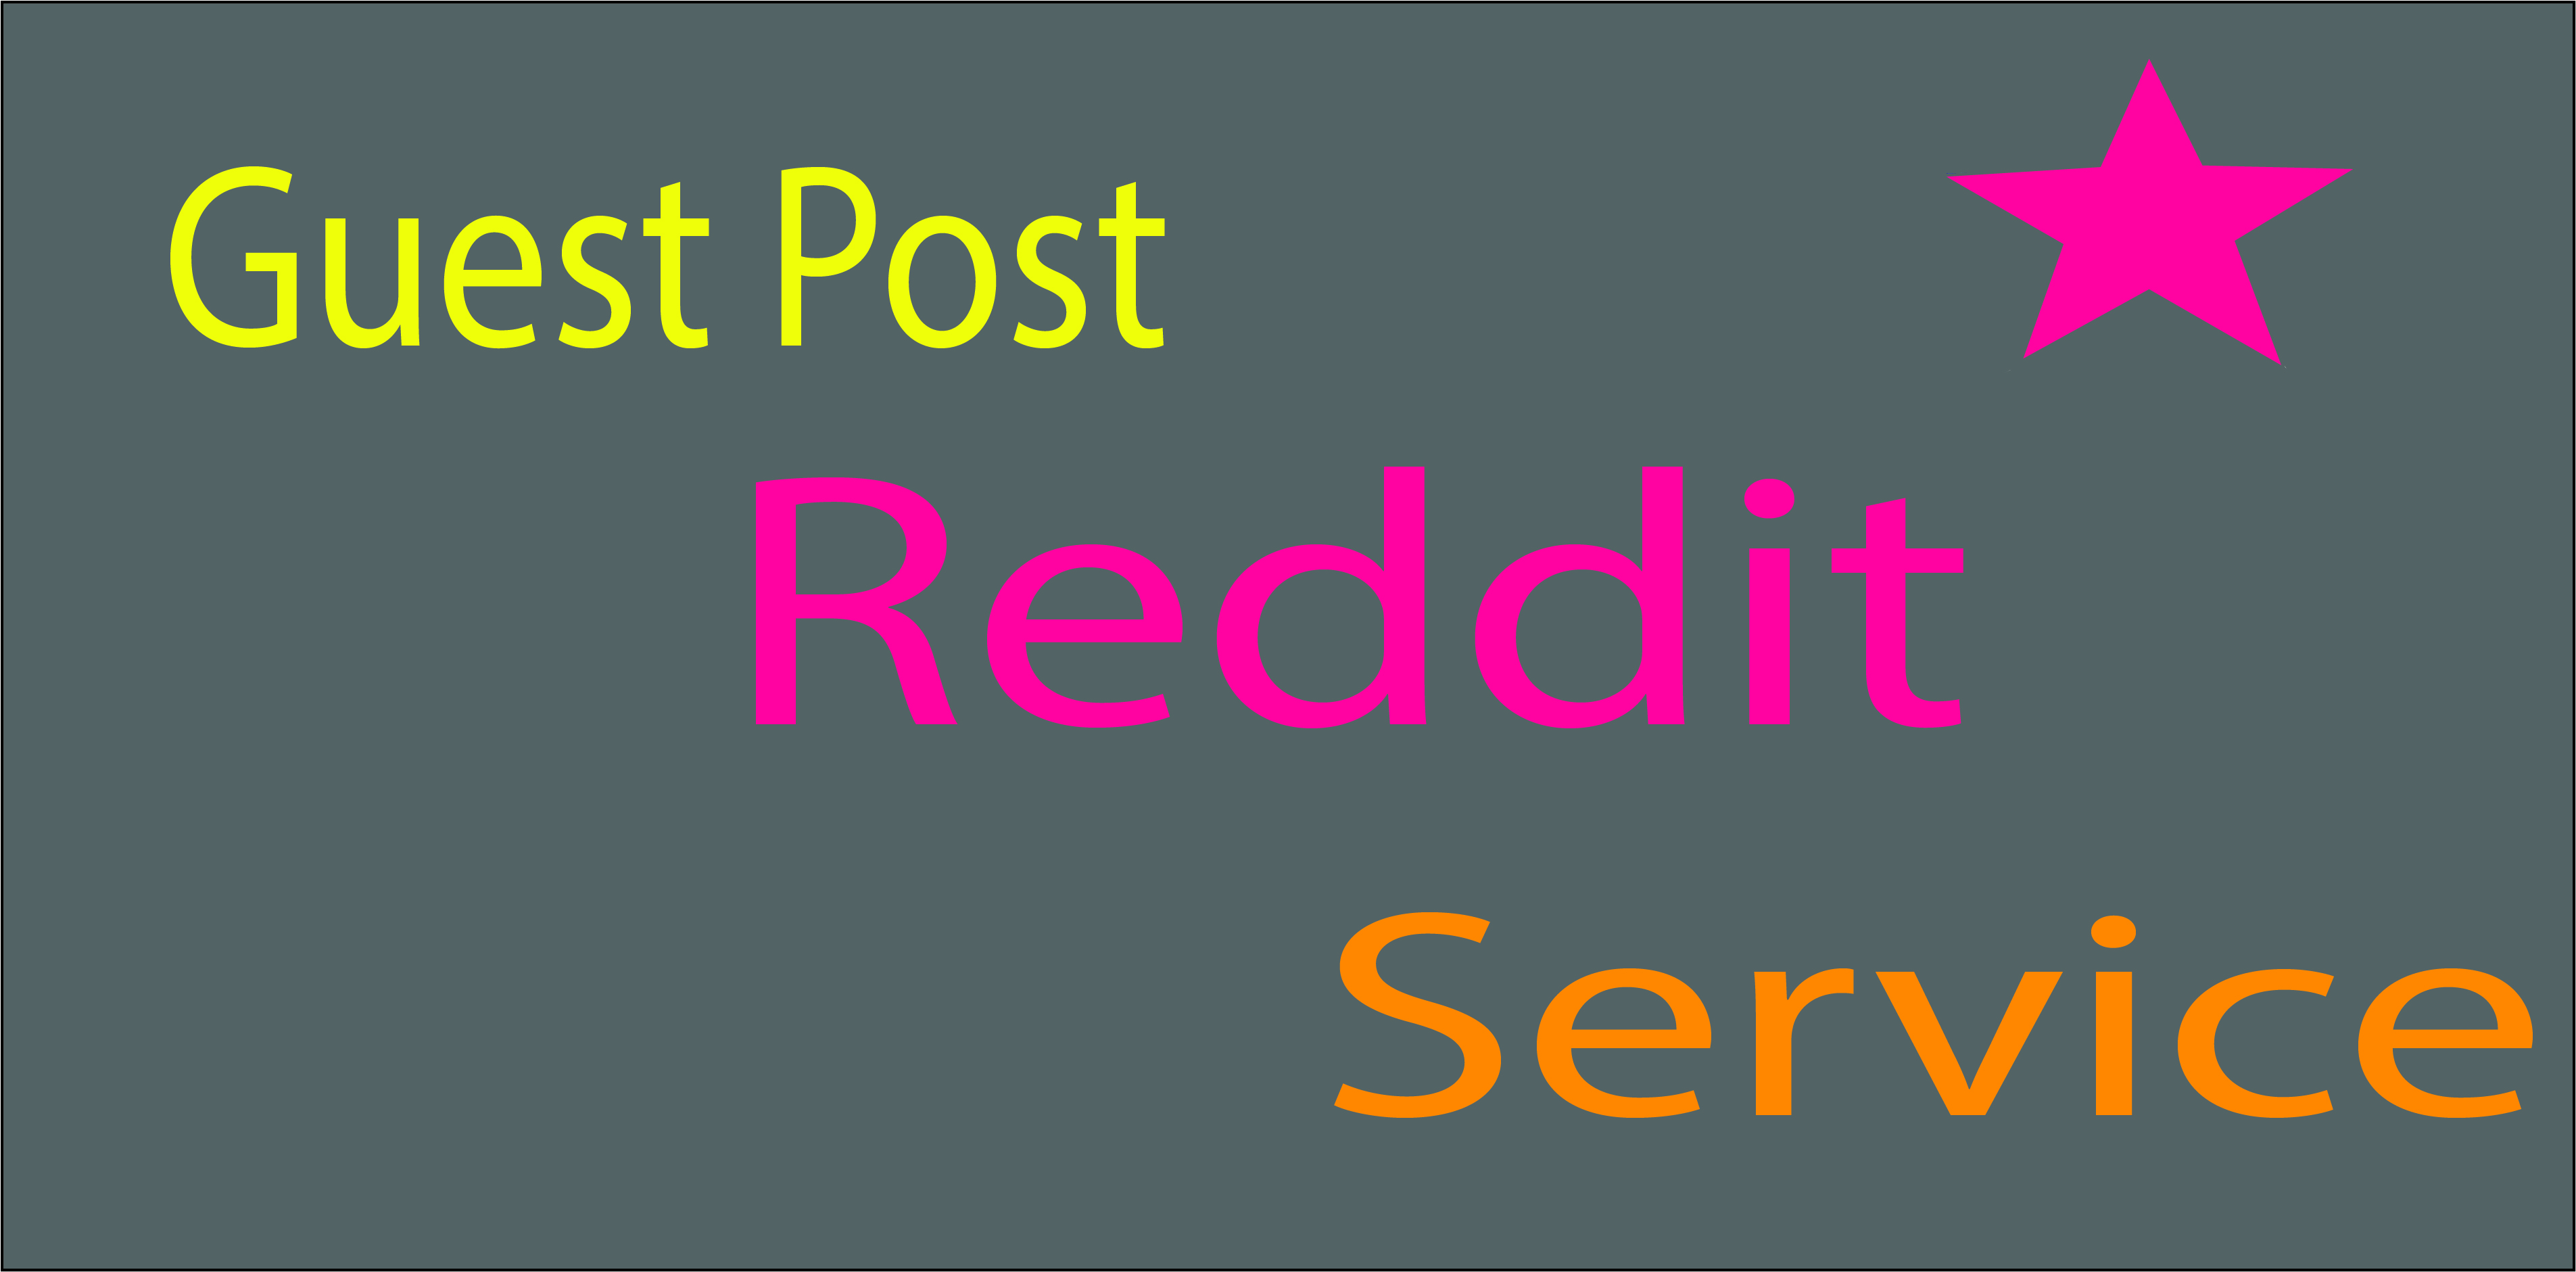 I will create guest post backlinks on Reddit com